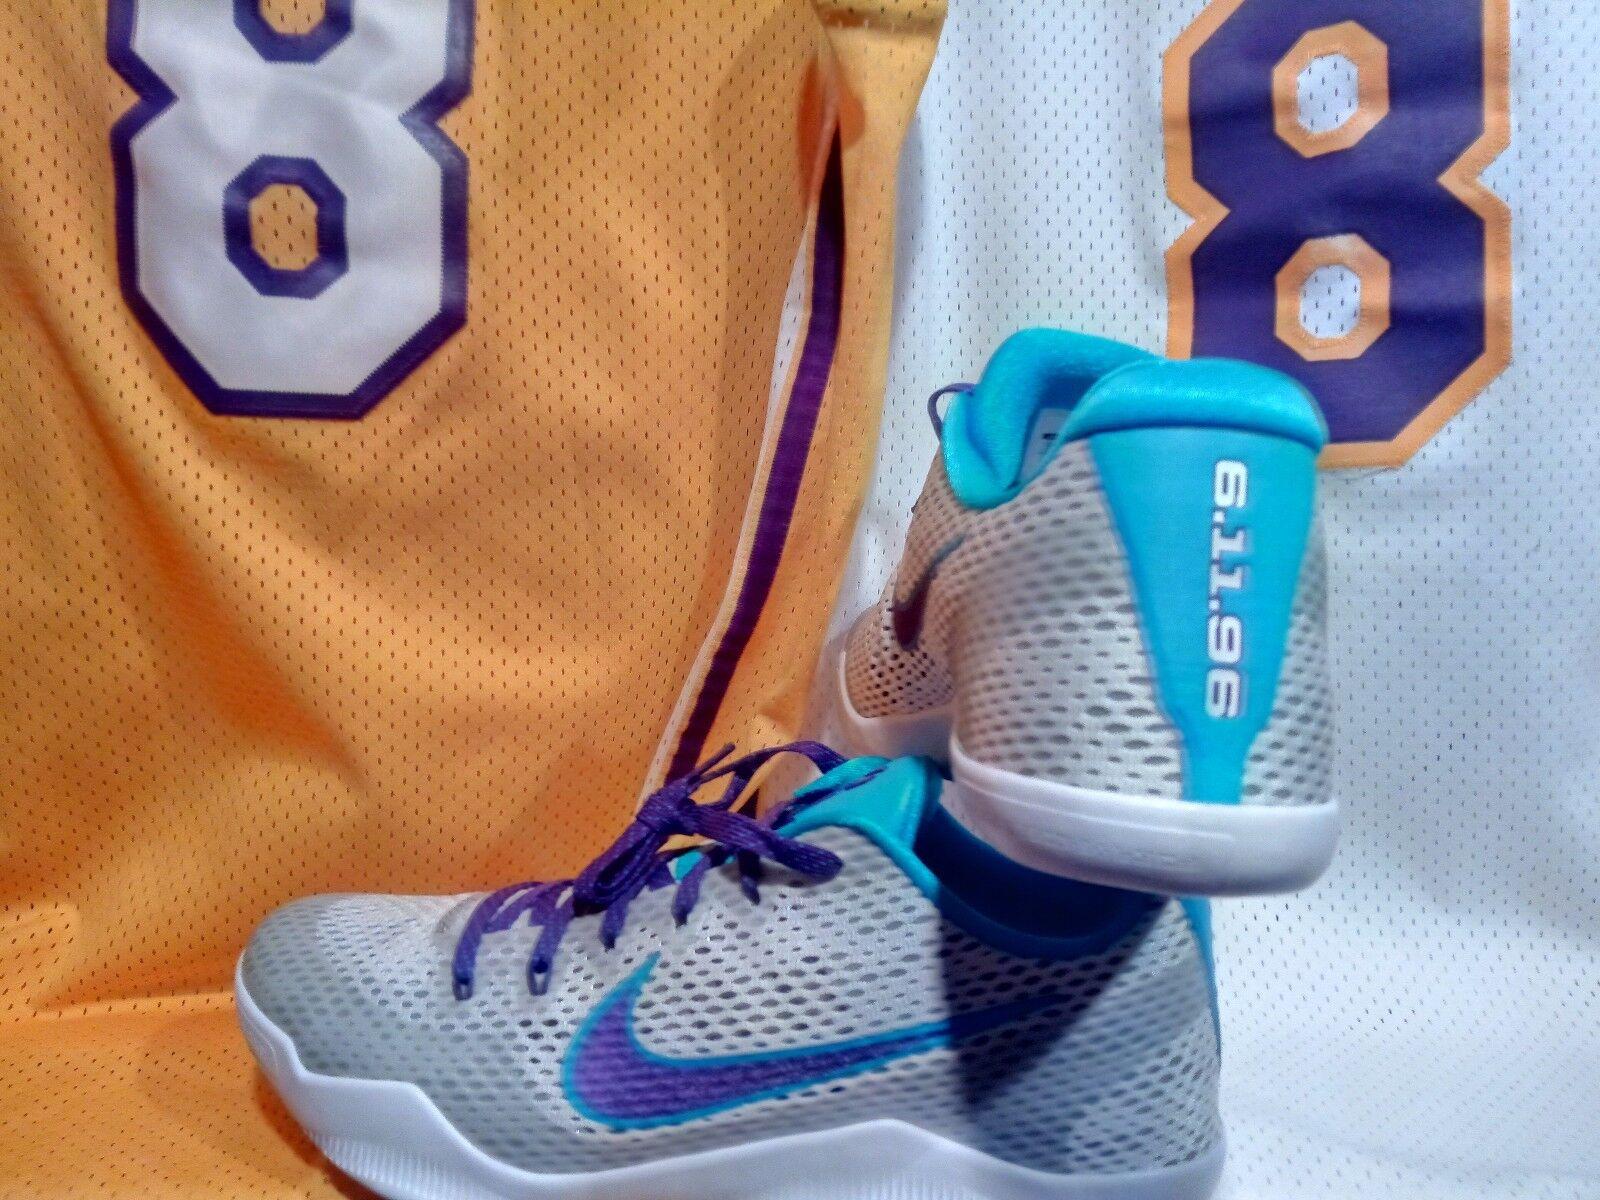 Kobe Bryant Draft dayshoes 6/11/1996 Size 12